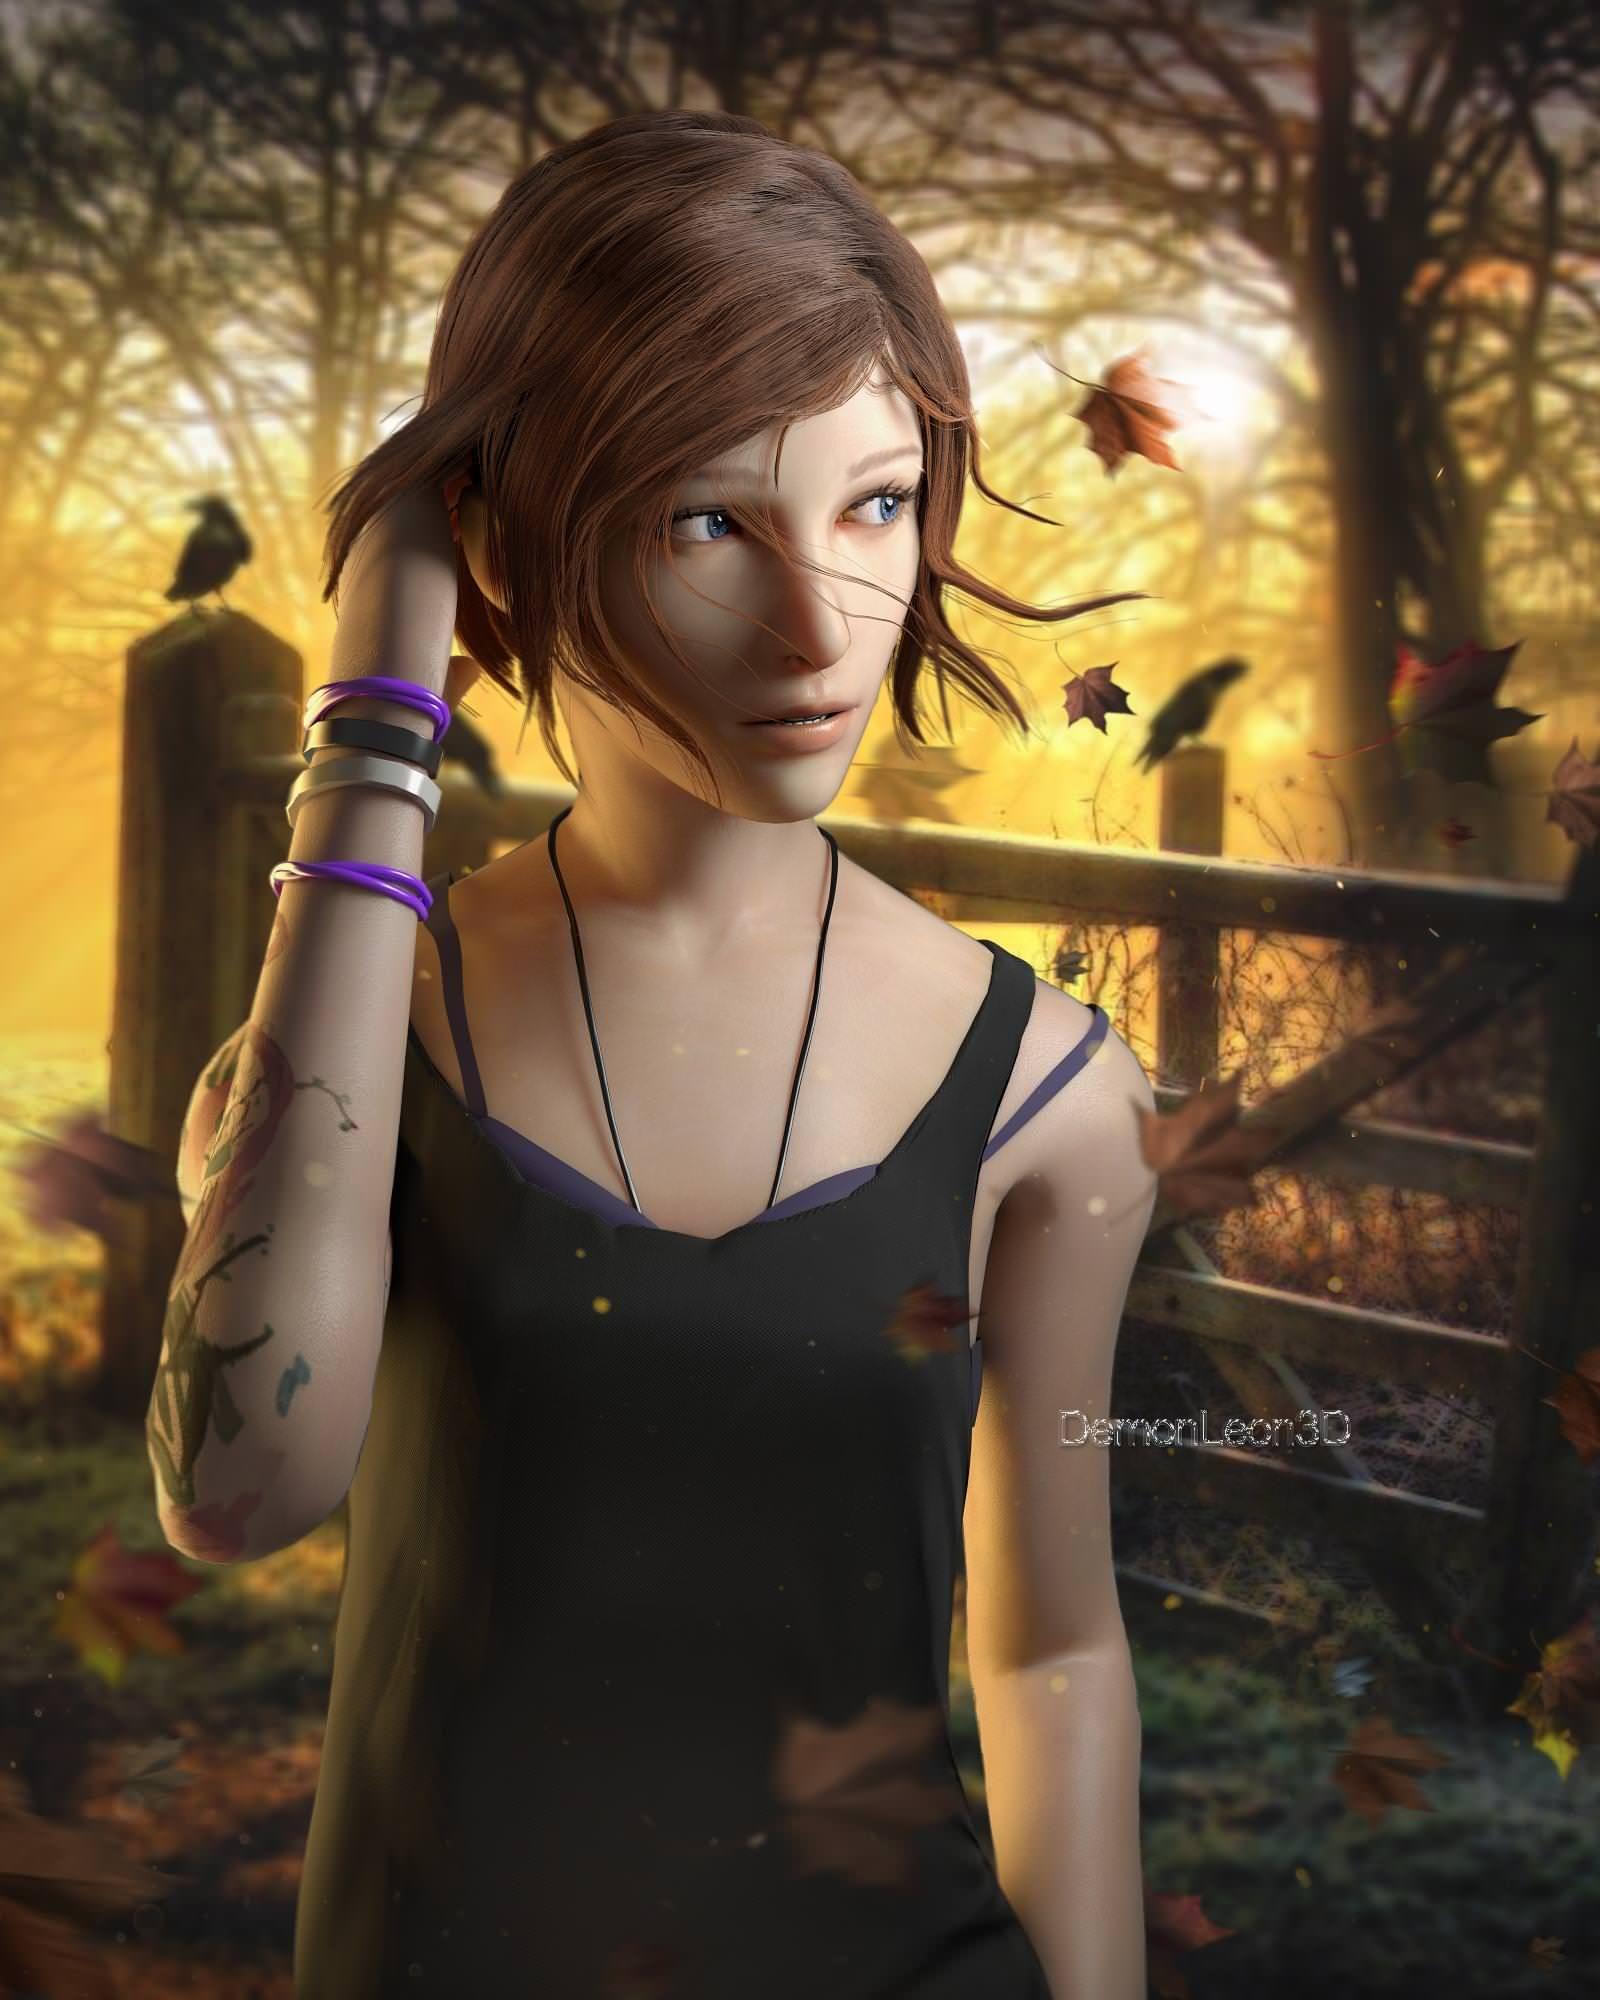 Chloe Price Life Is Strange Life Is Strange 3 Life Is Strange